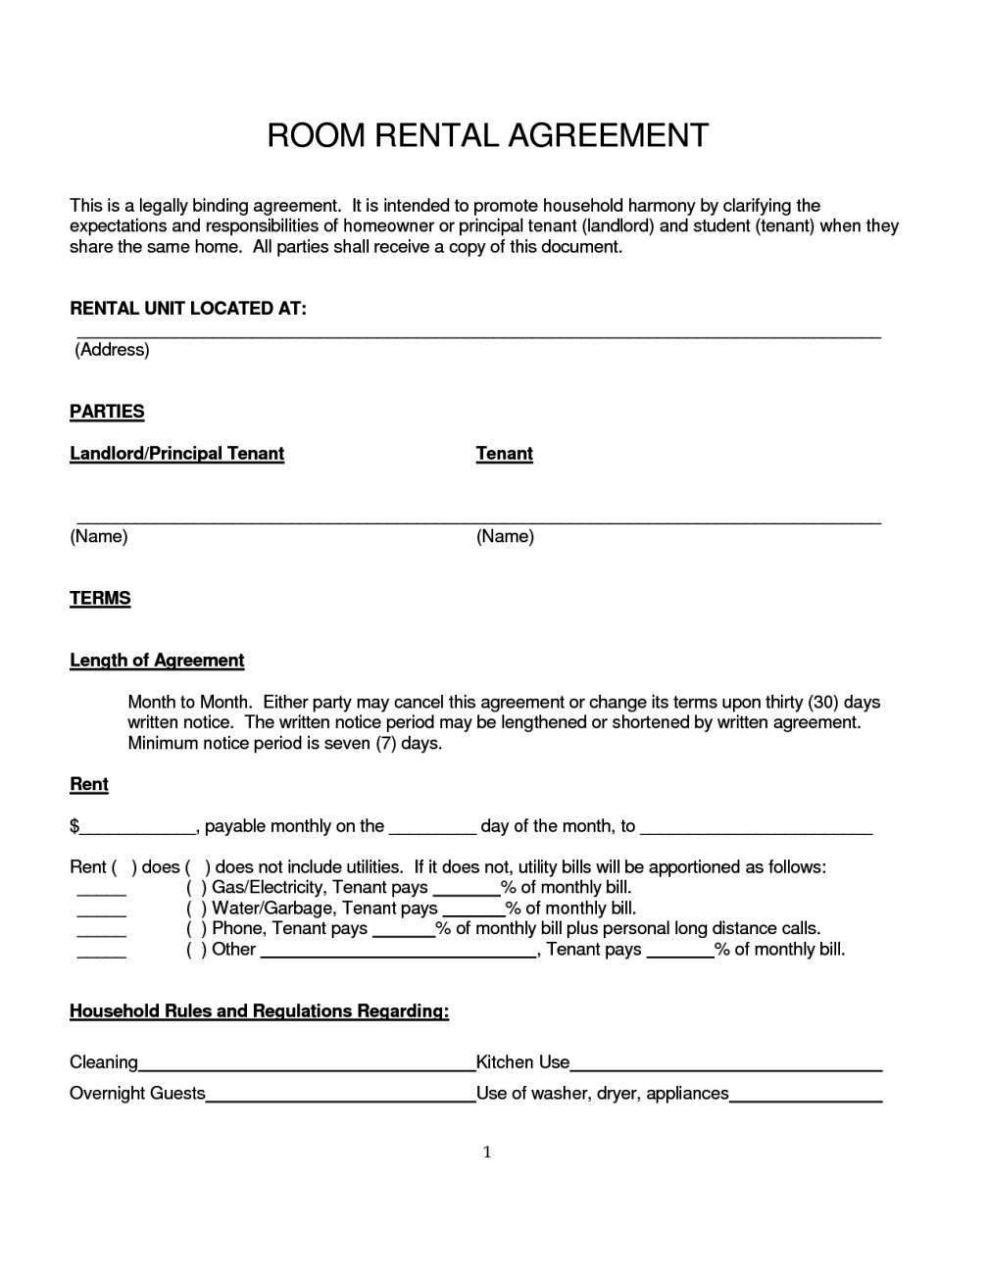 sample house rental agreement word format